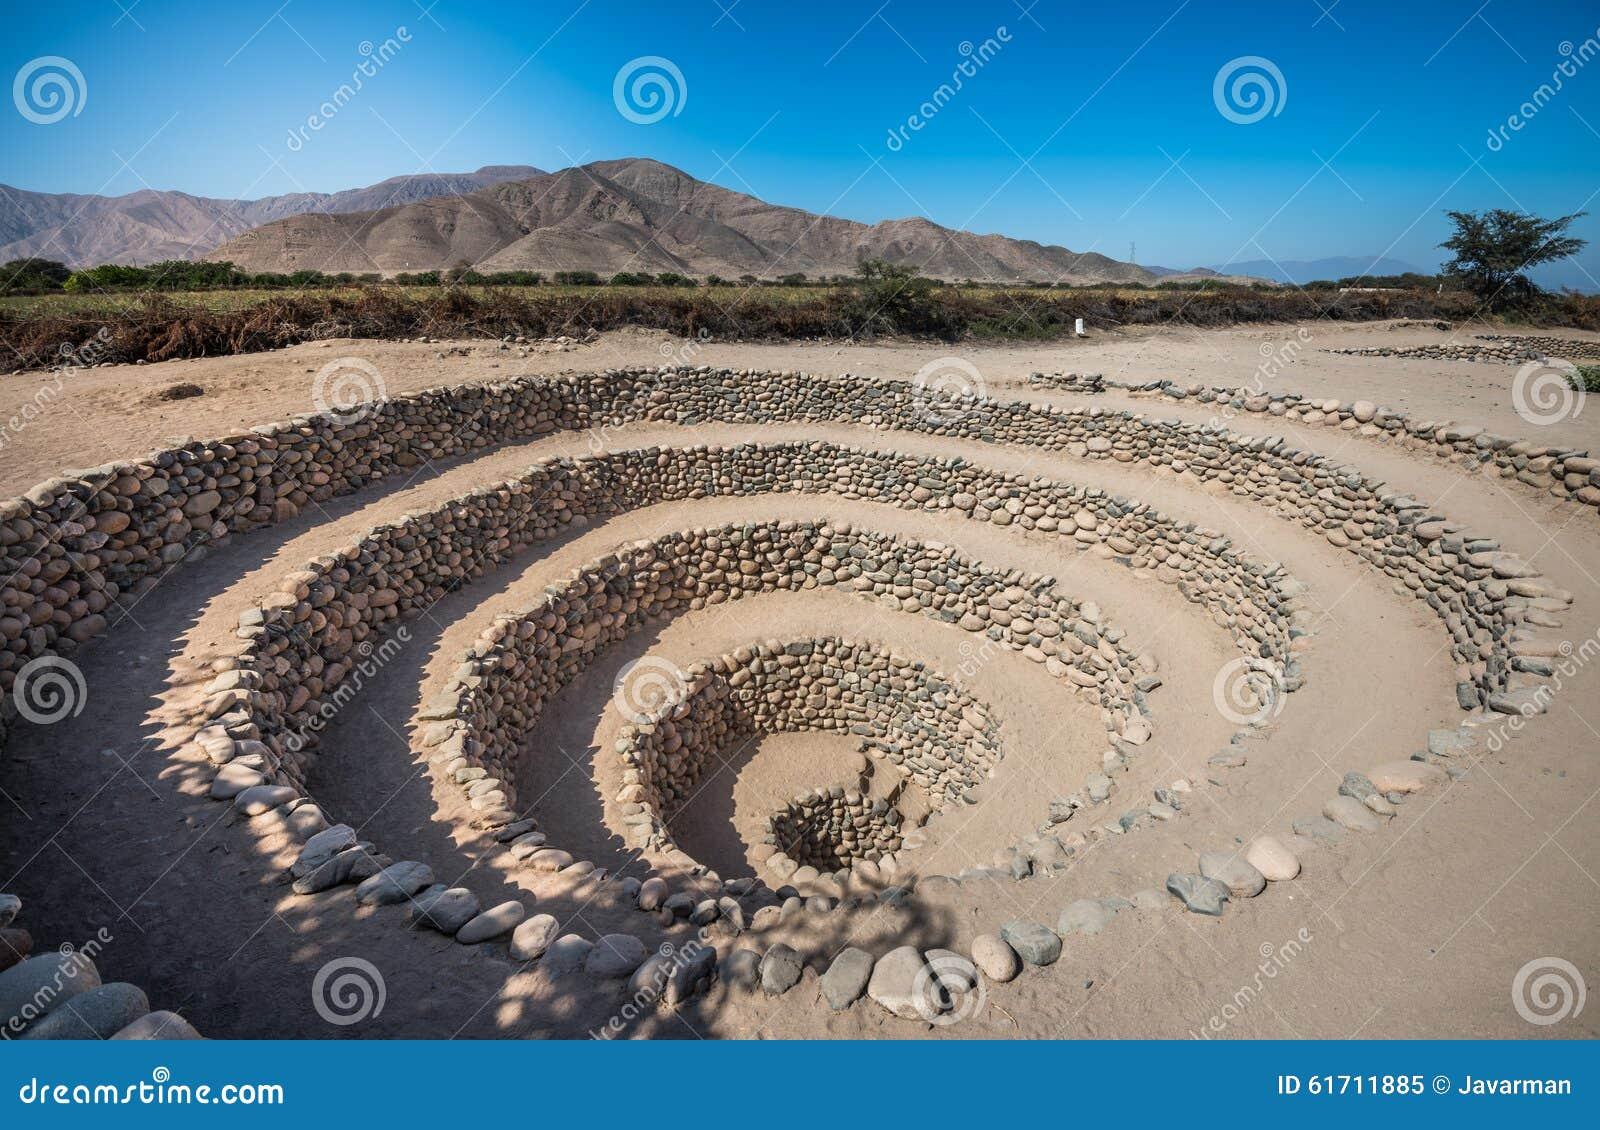 Download Cantalloc Aqueduct Near Nazca, Peru Stock Image - Image of destination, cantalloc: 61711885